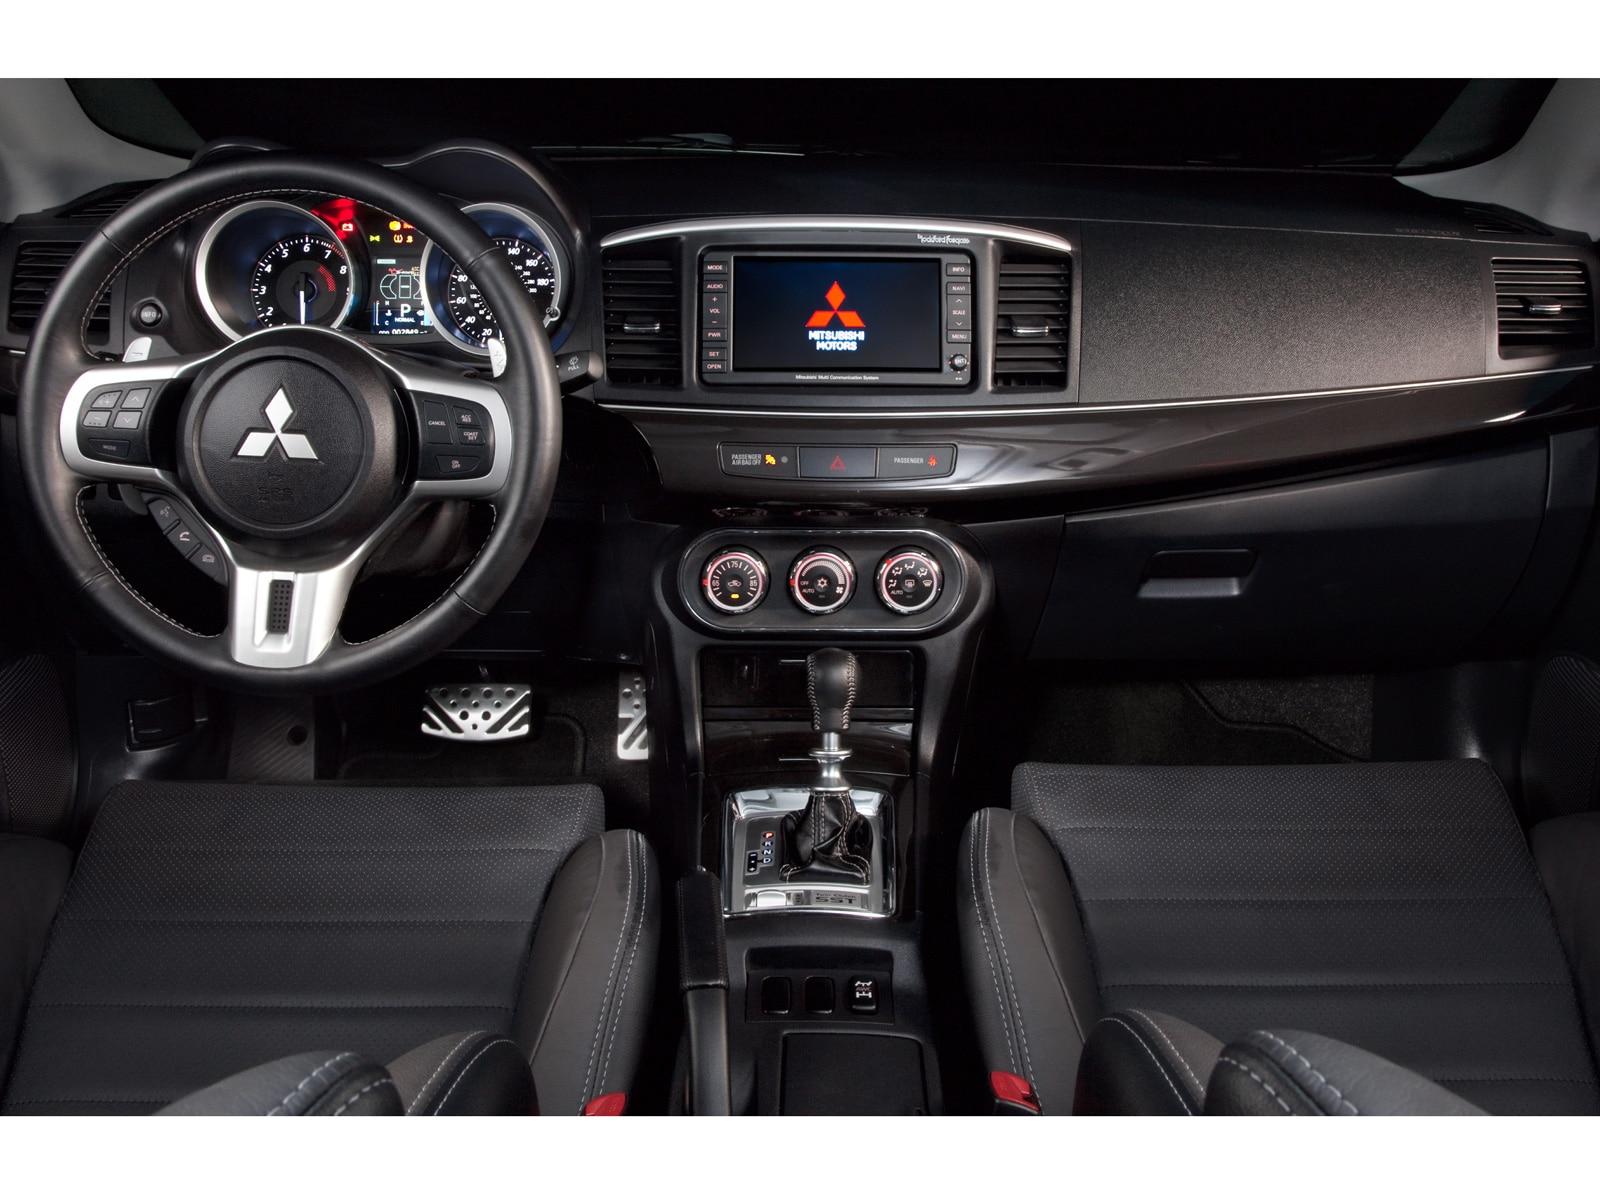 2010 mitsubishi lancer evolution mr touring - mitsubishi sport sedan